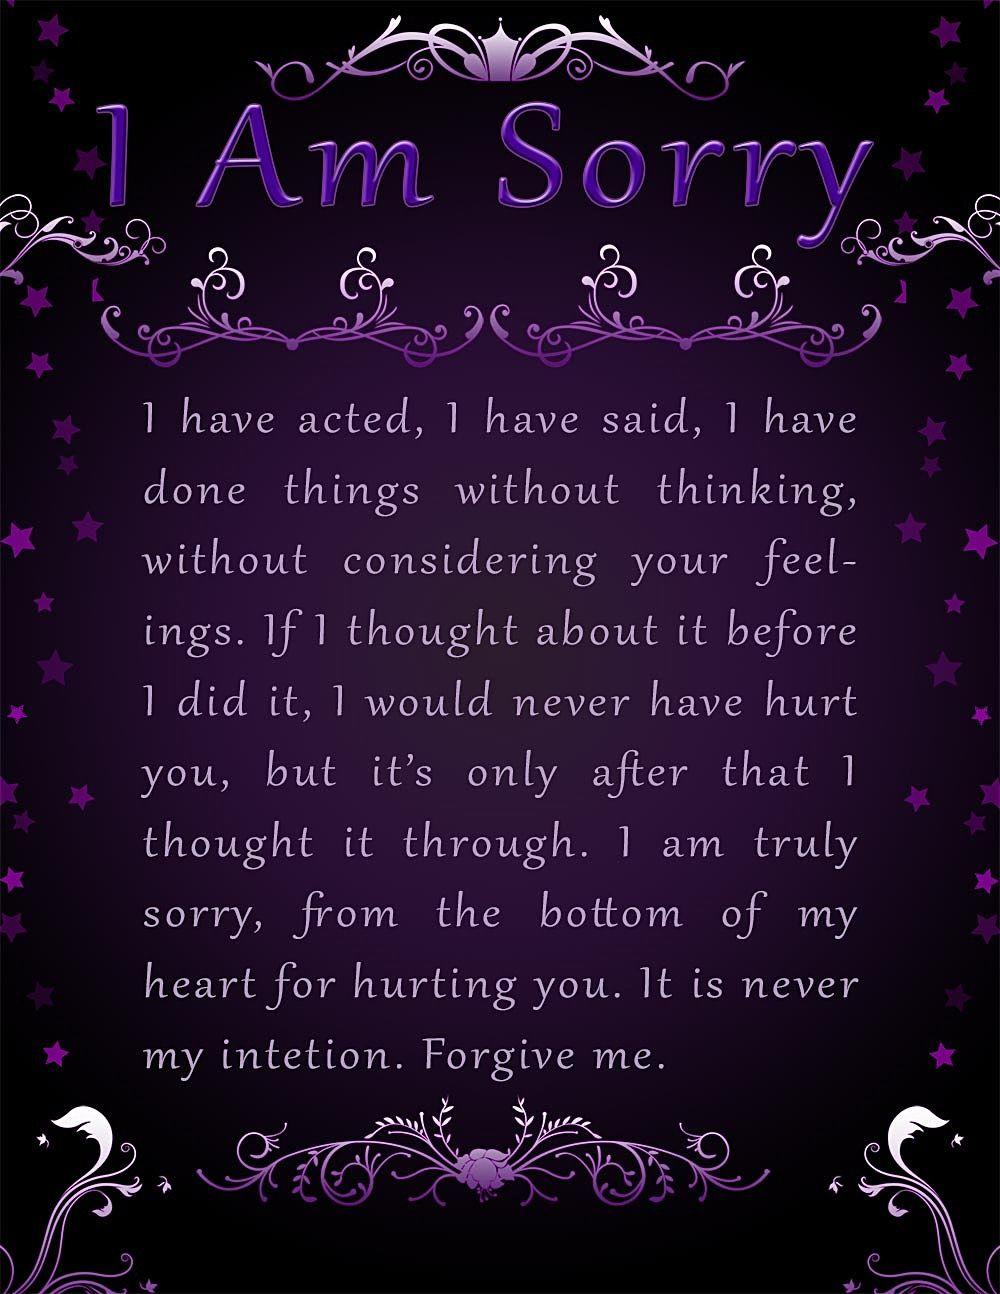 Apology Card Templates | 10+ Free Printable Word & Pdf - Free Printable I Am Sorry Cards